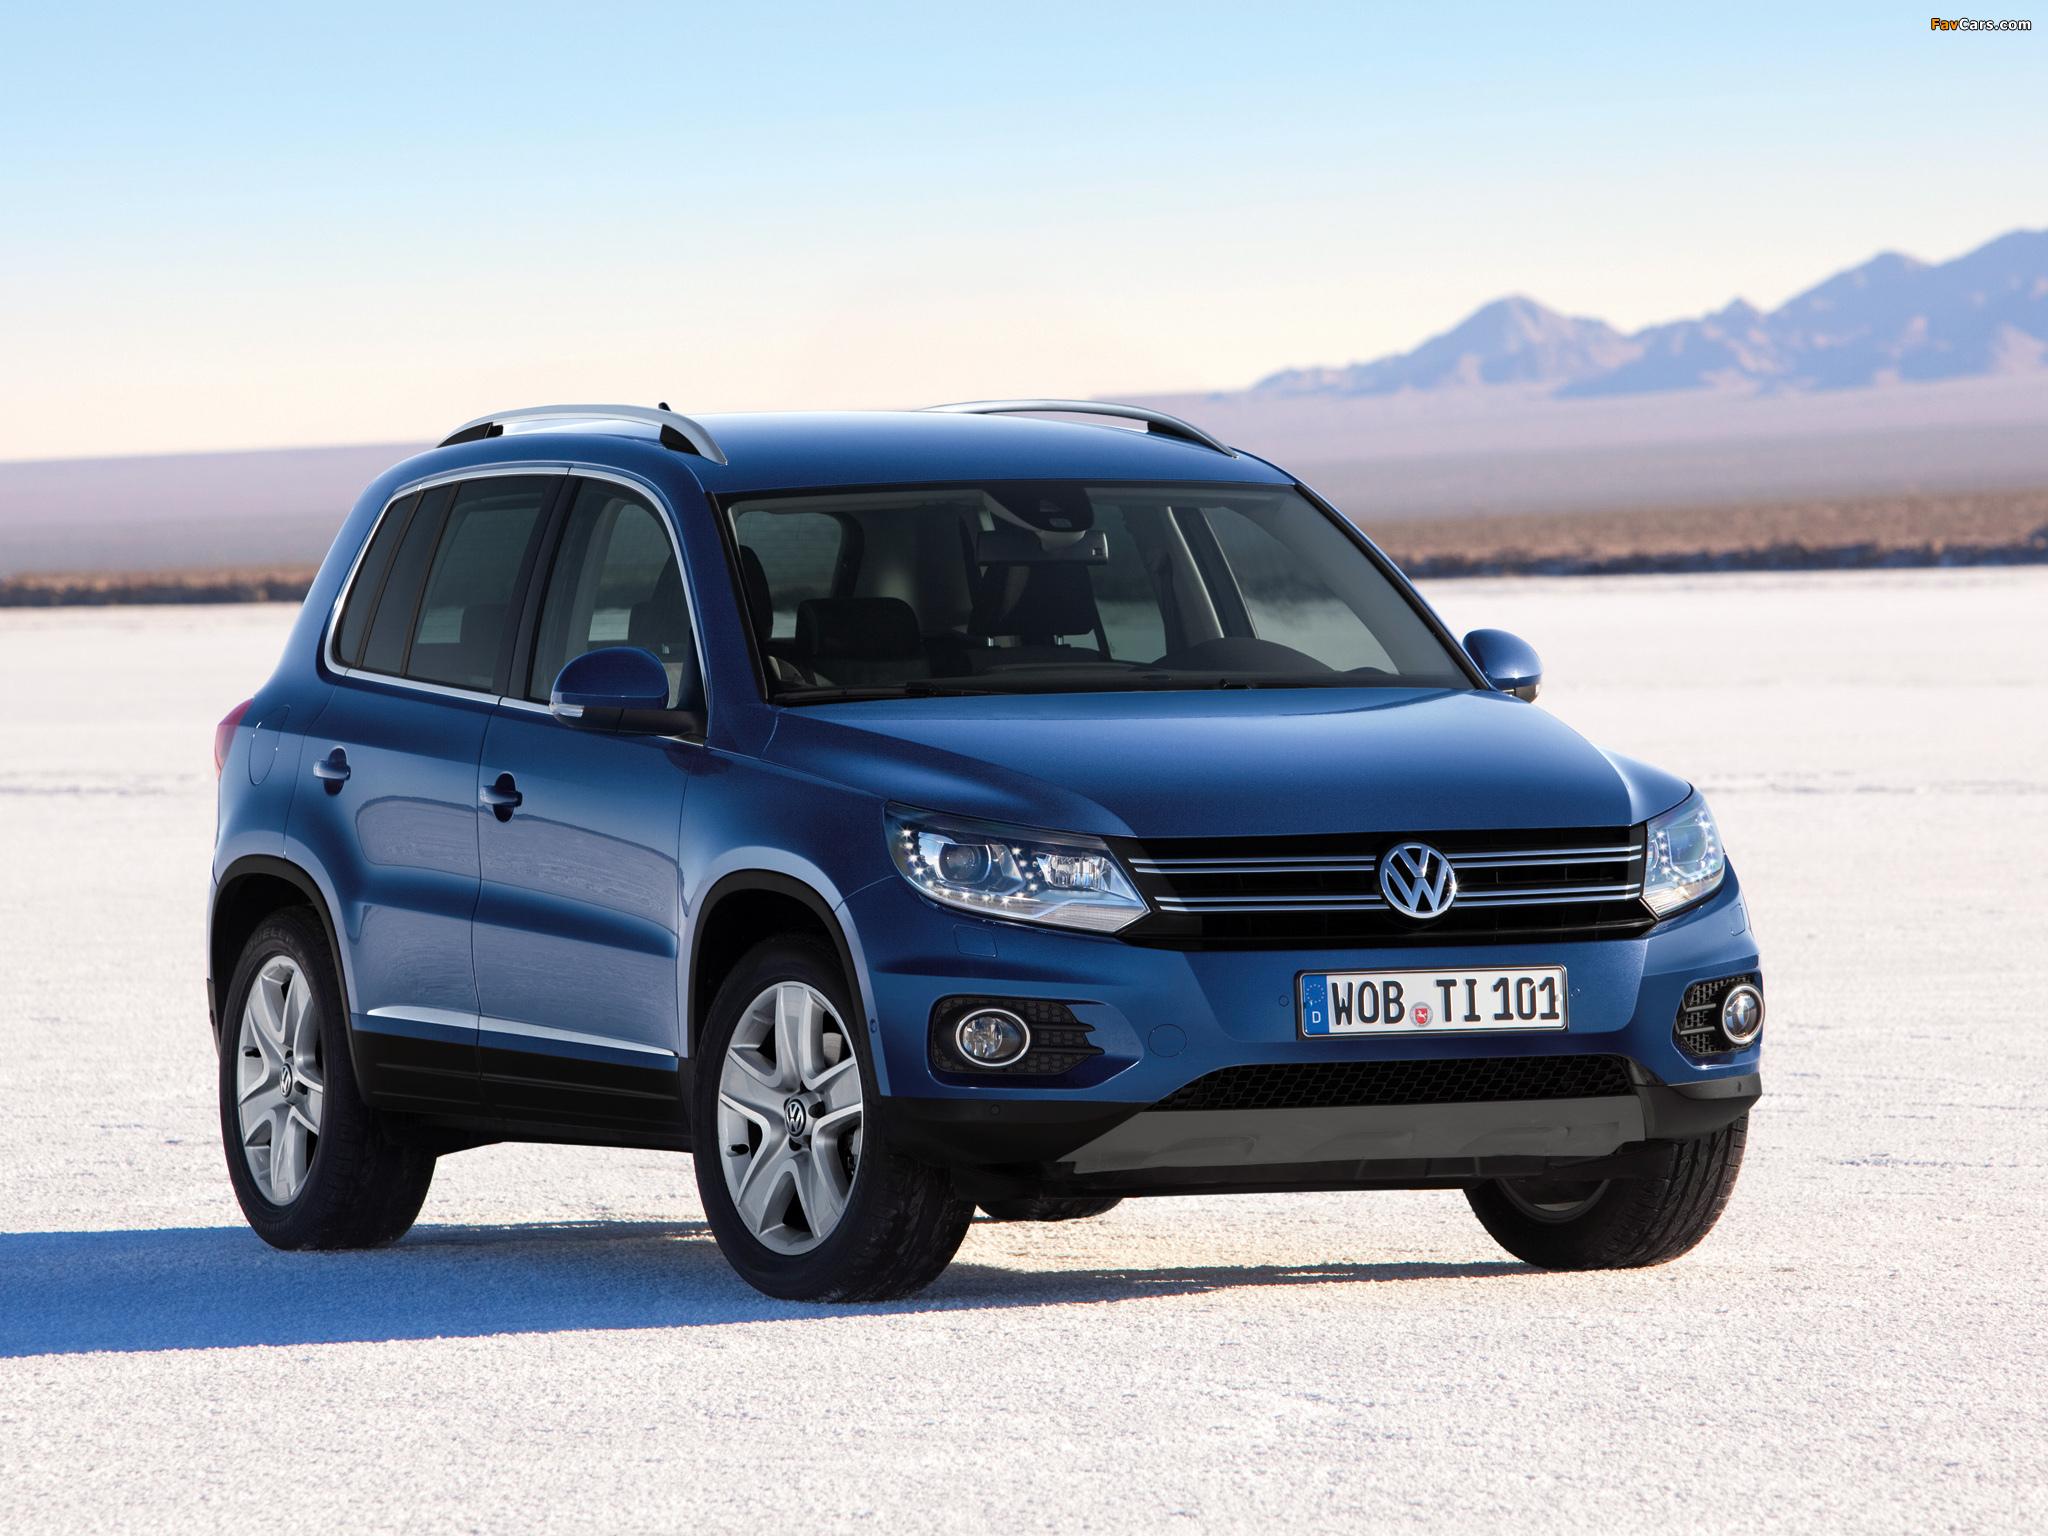 Volkswagen Tiguan Track & Style 2011 photos (2048 x 1536)